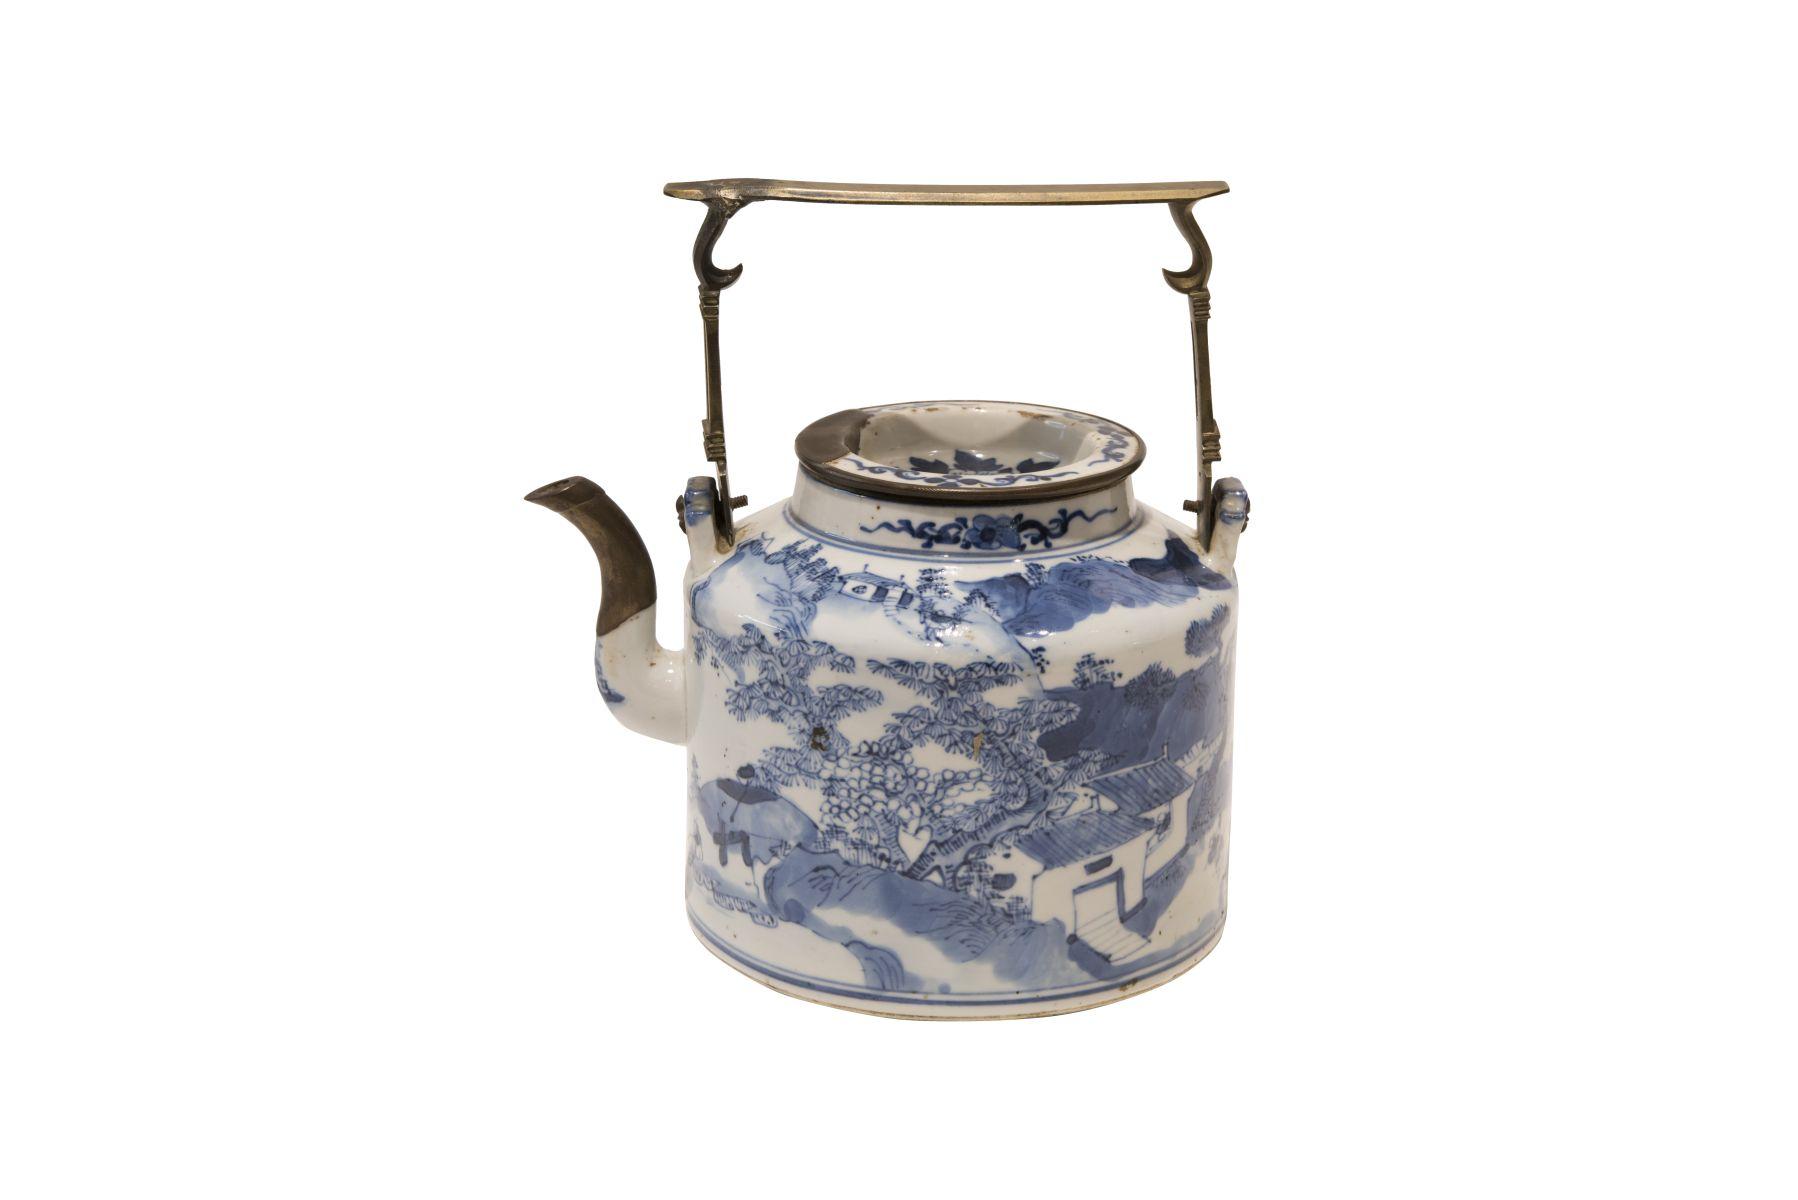 #35 Bon China teapot blue and white | Blau-weiße Teekanne Image